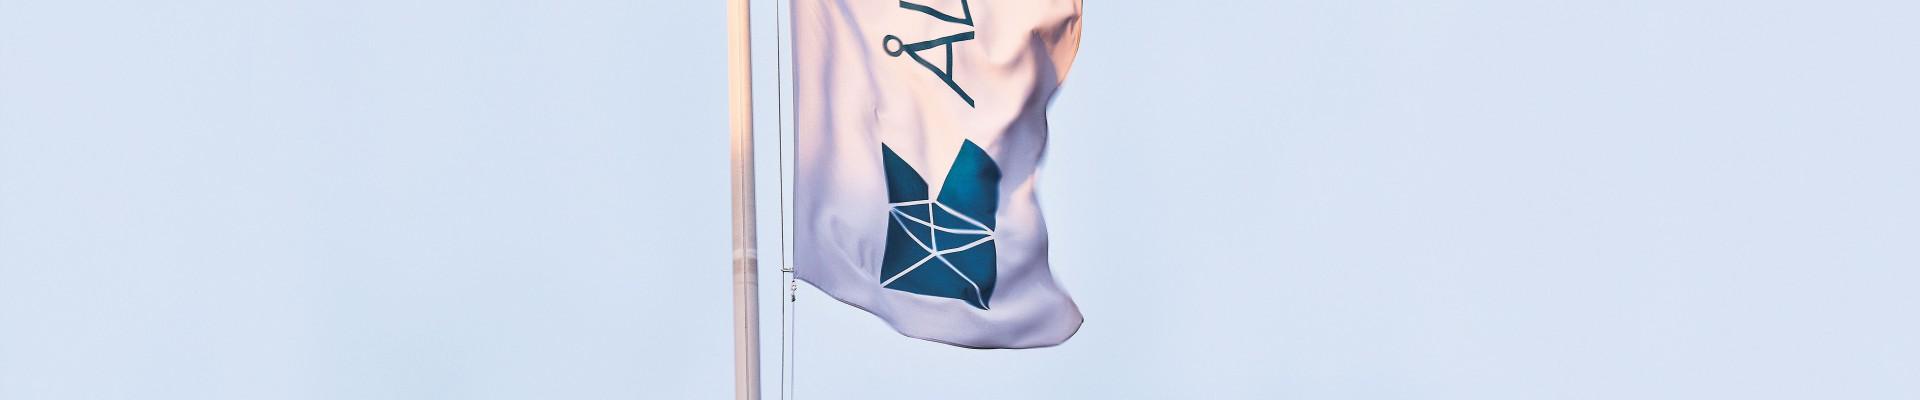 Flagga Sviby postterminal